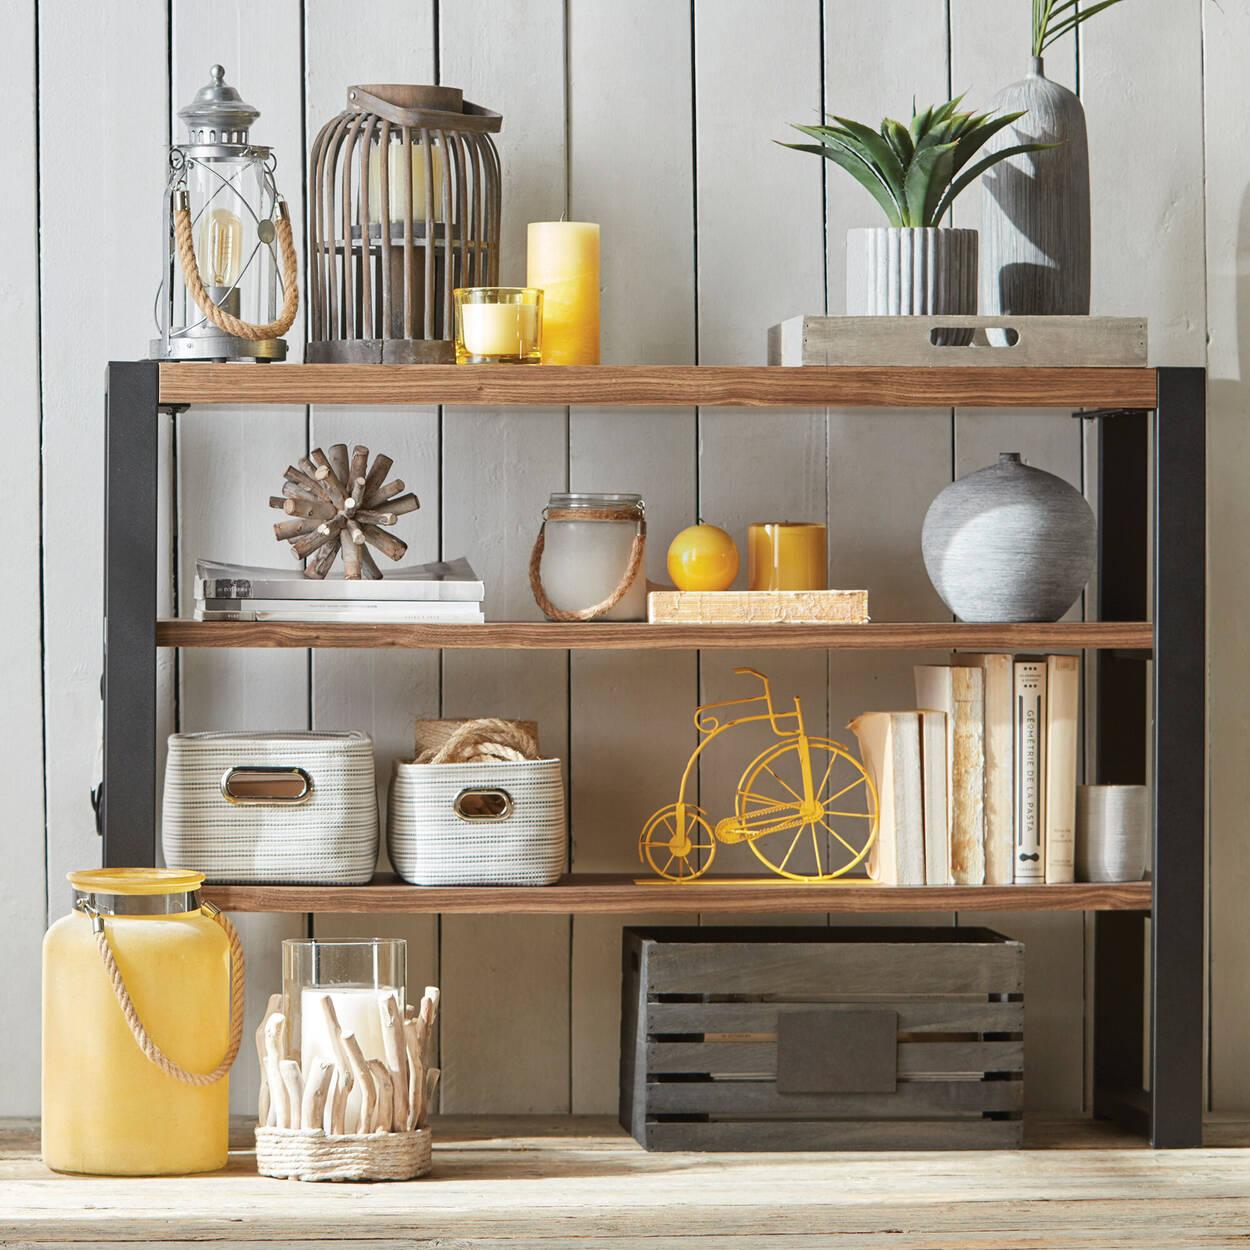 Two-Toned Striped Storage Basket